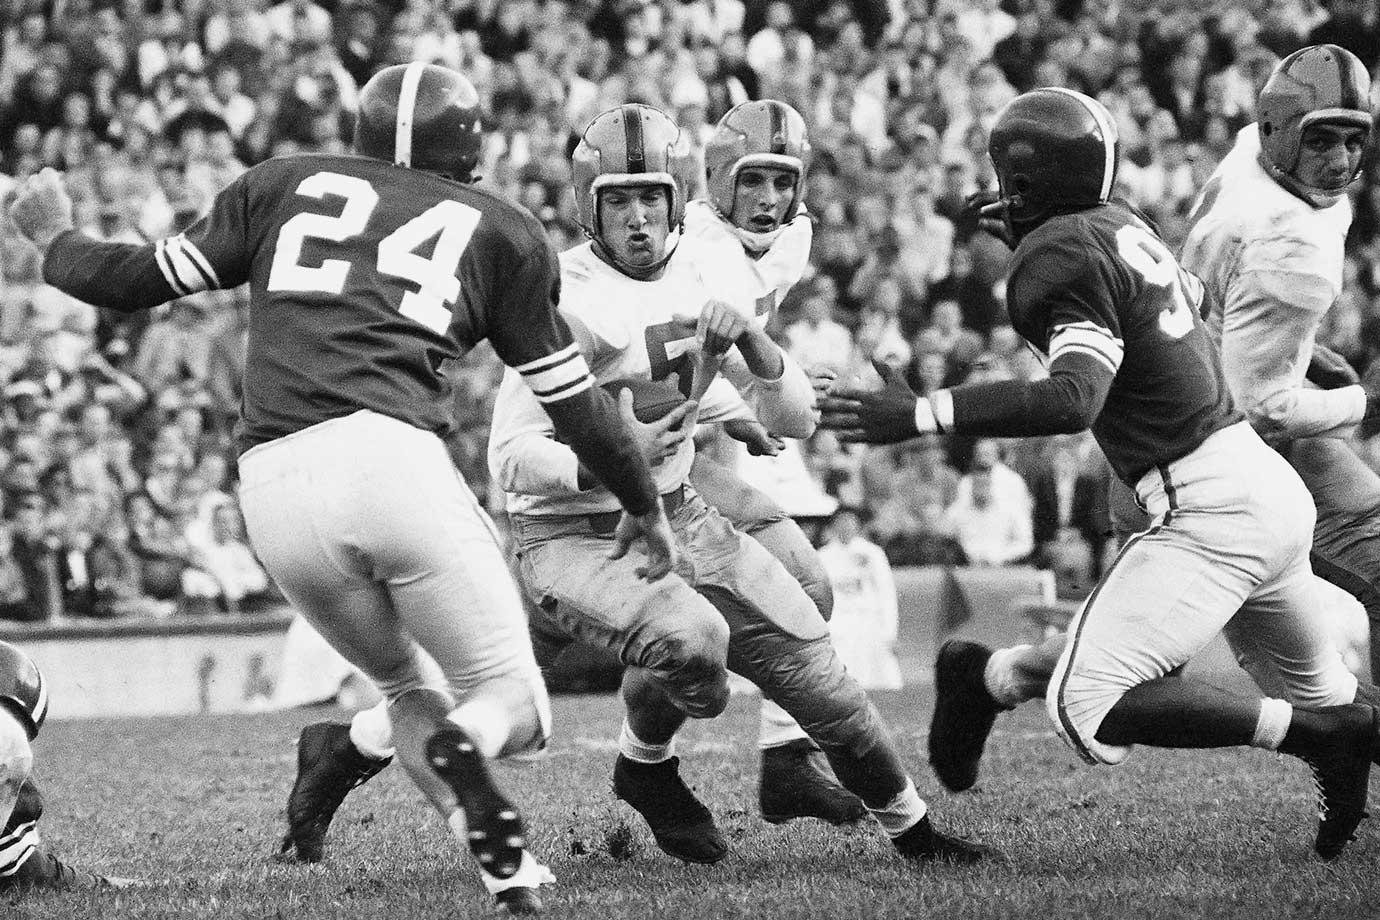 Oct. 15, 1955 — Notre Dame vs. Michigan State